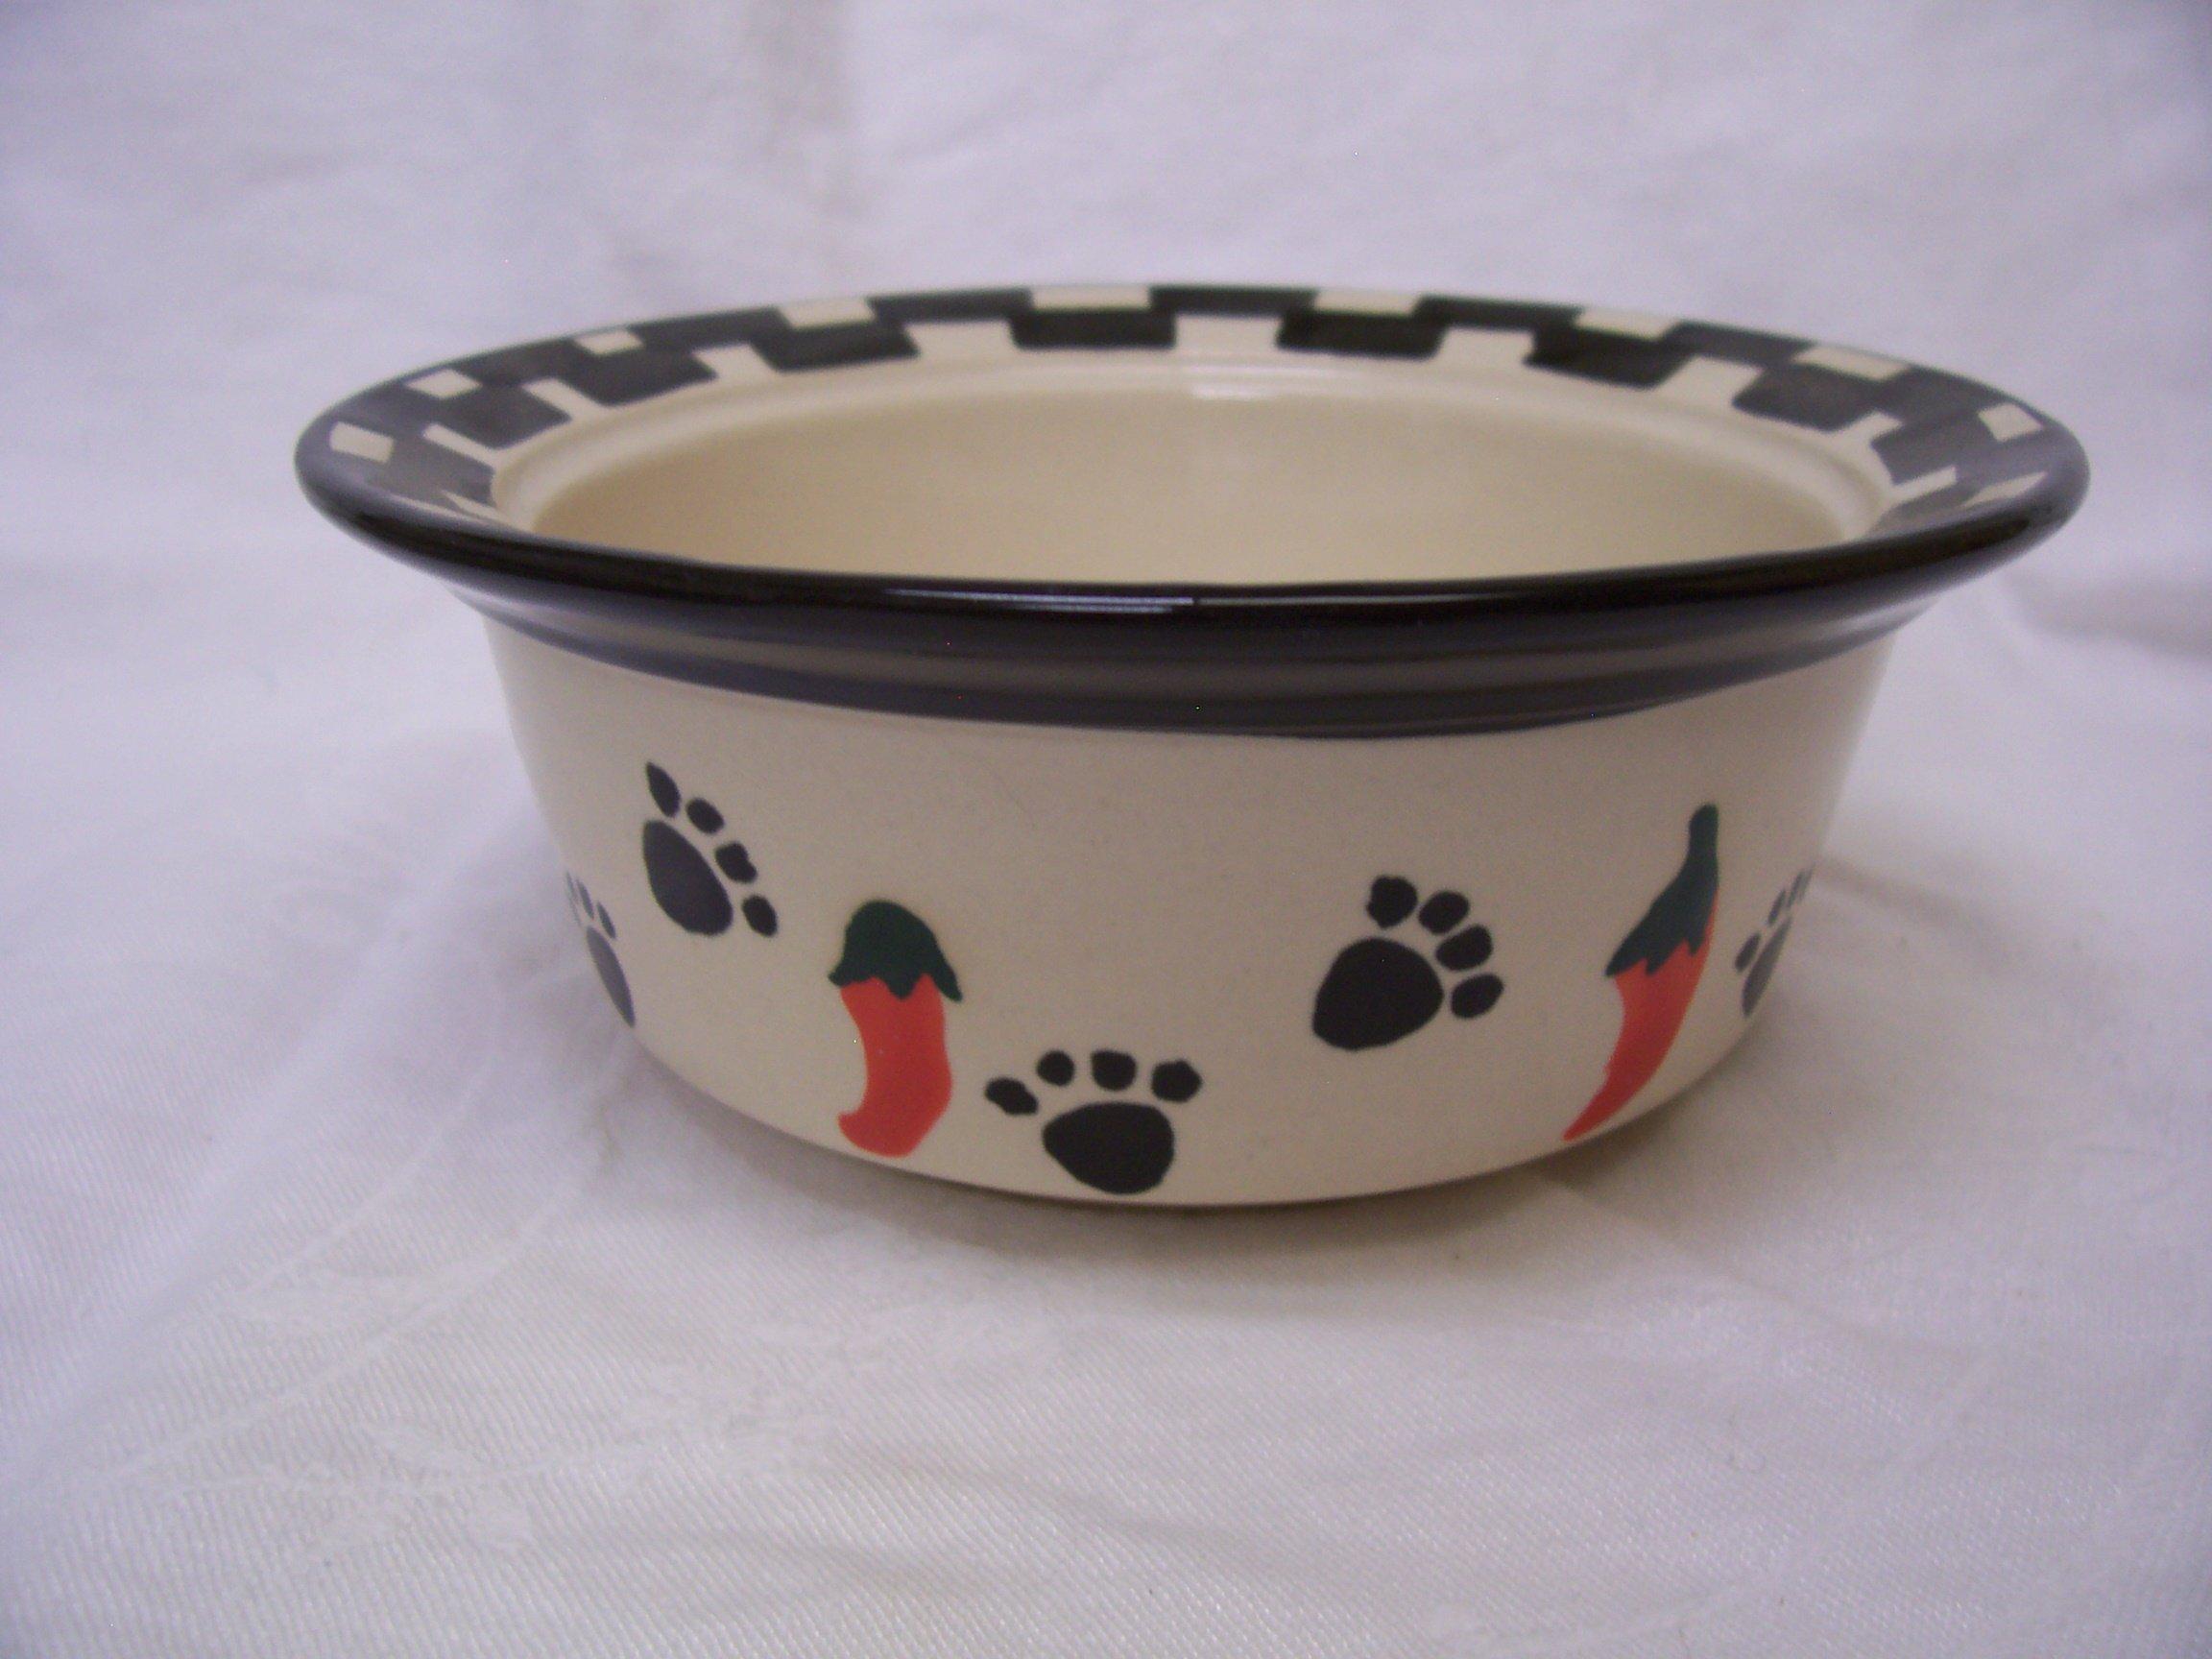 Petrageous Designs Lucy's Little Paws, 5'' Pet Bowl, Blue & Green Assorted